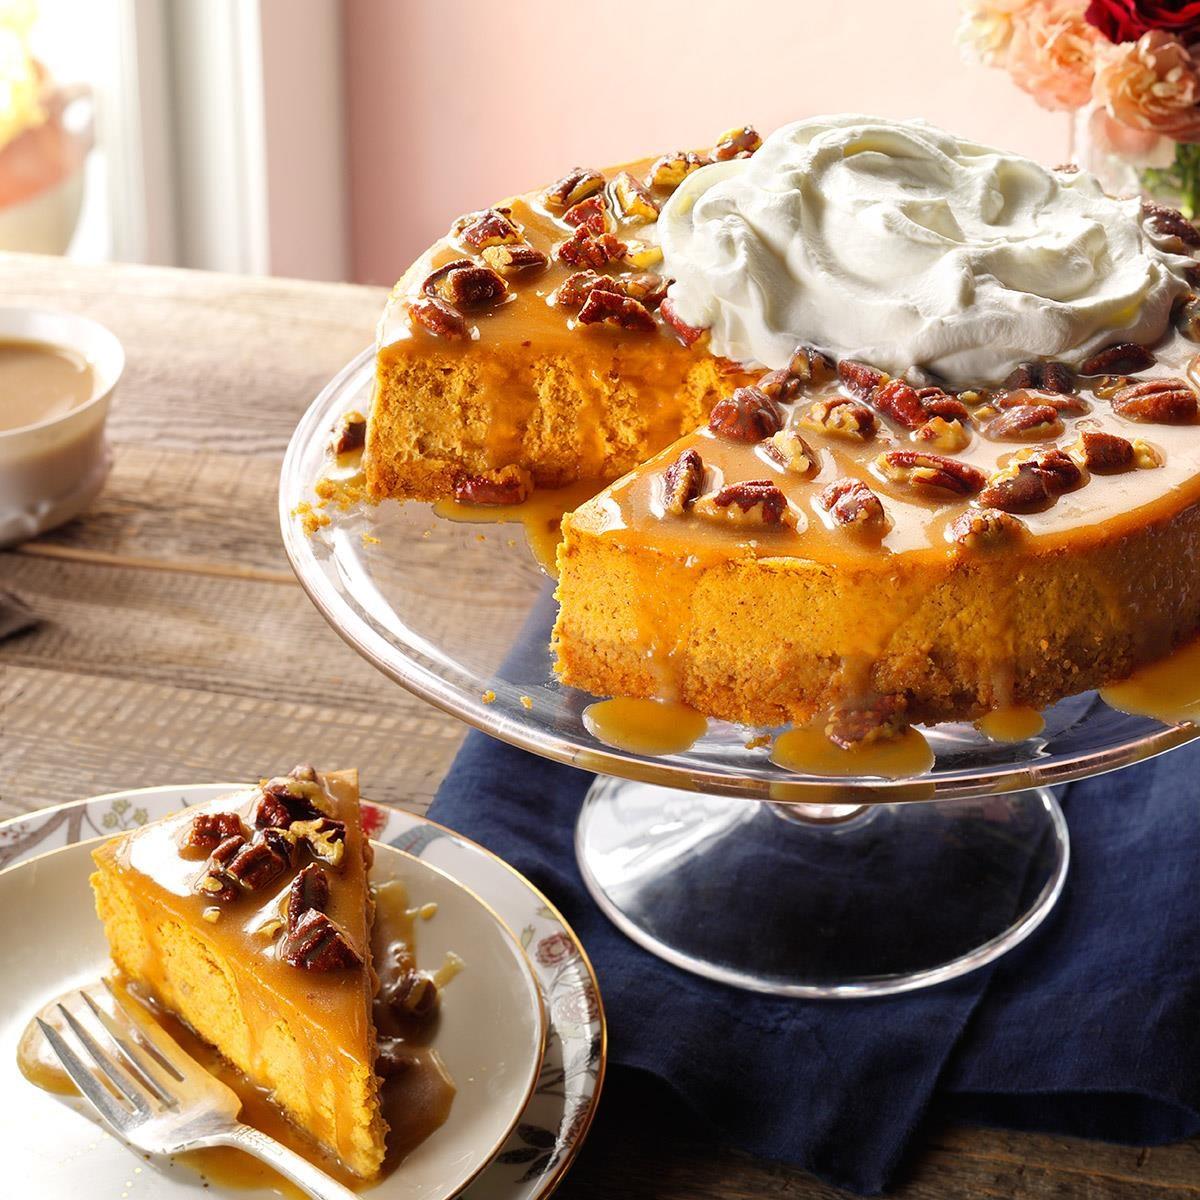 Award Winning Cake Recipes From Scratch: Pecan Pumpkin Cheesecake Recipe